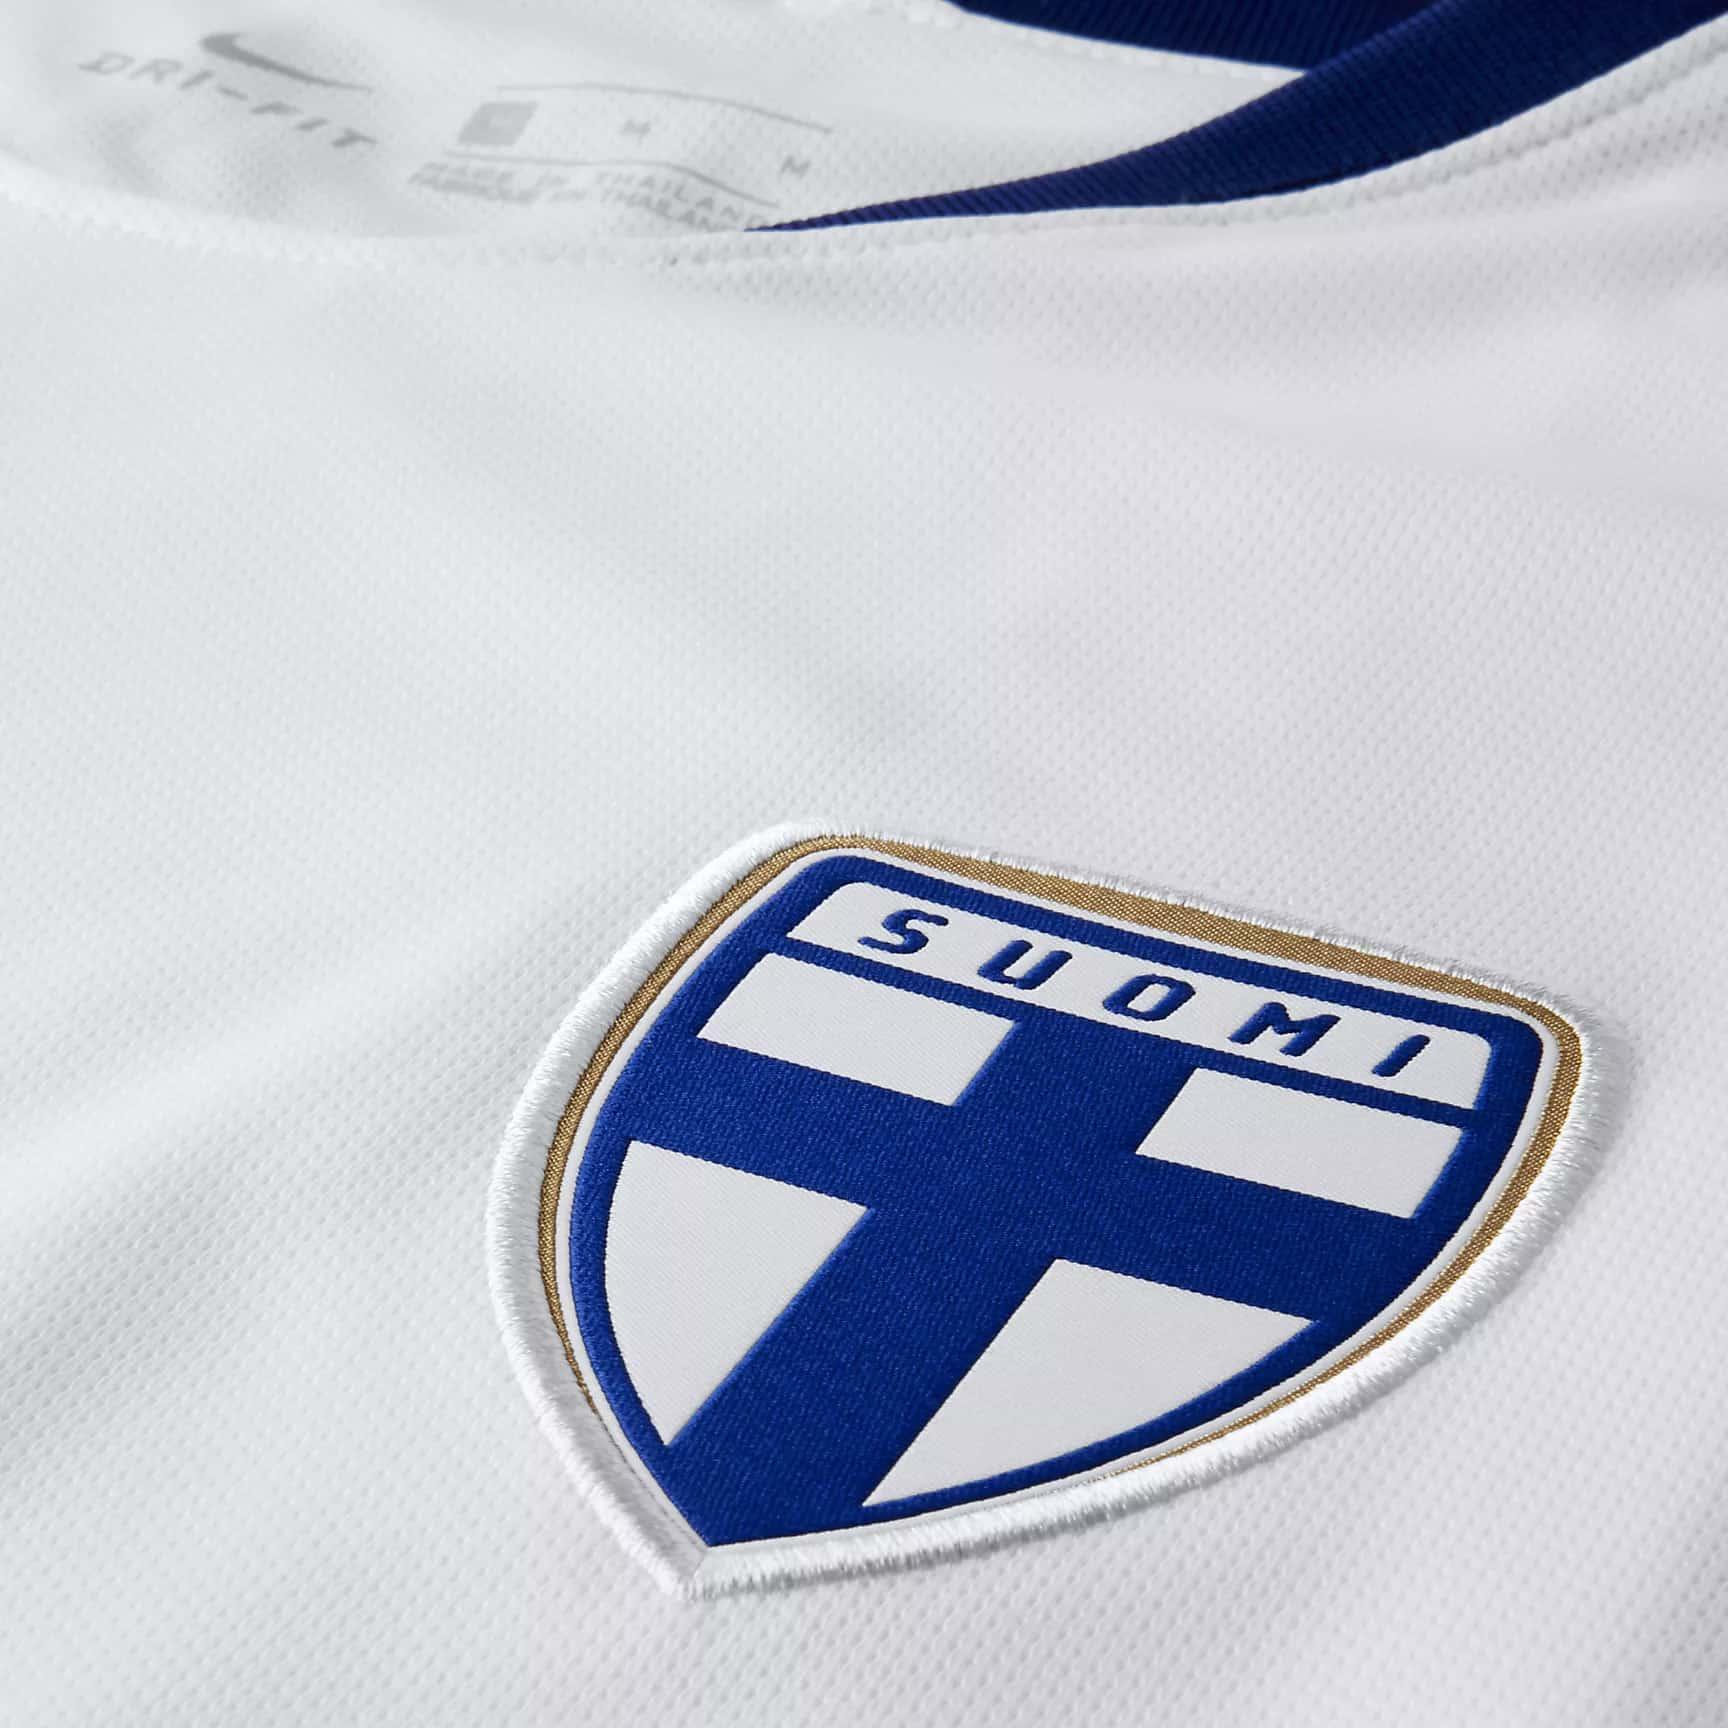 maillot-finlande-nike-6